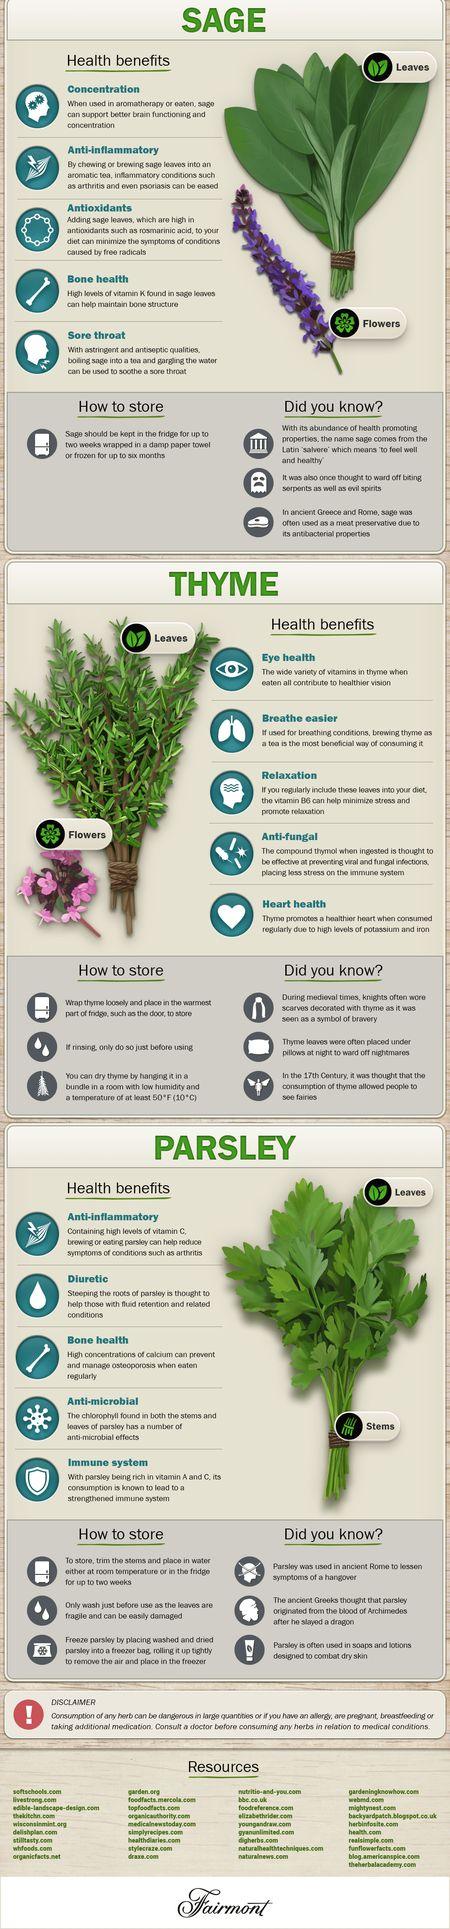 The health benefits of herbsJames Kozy